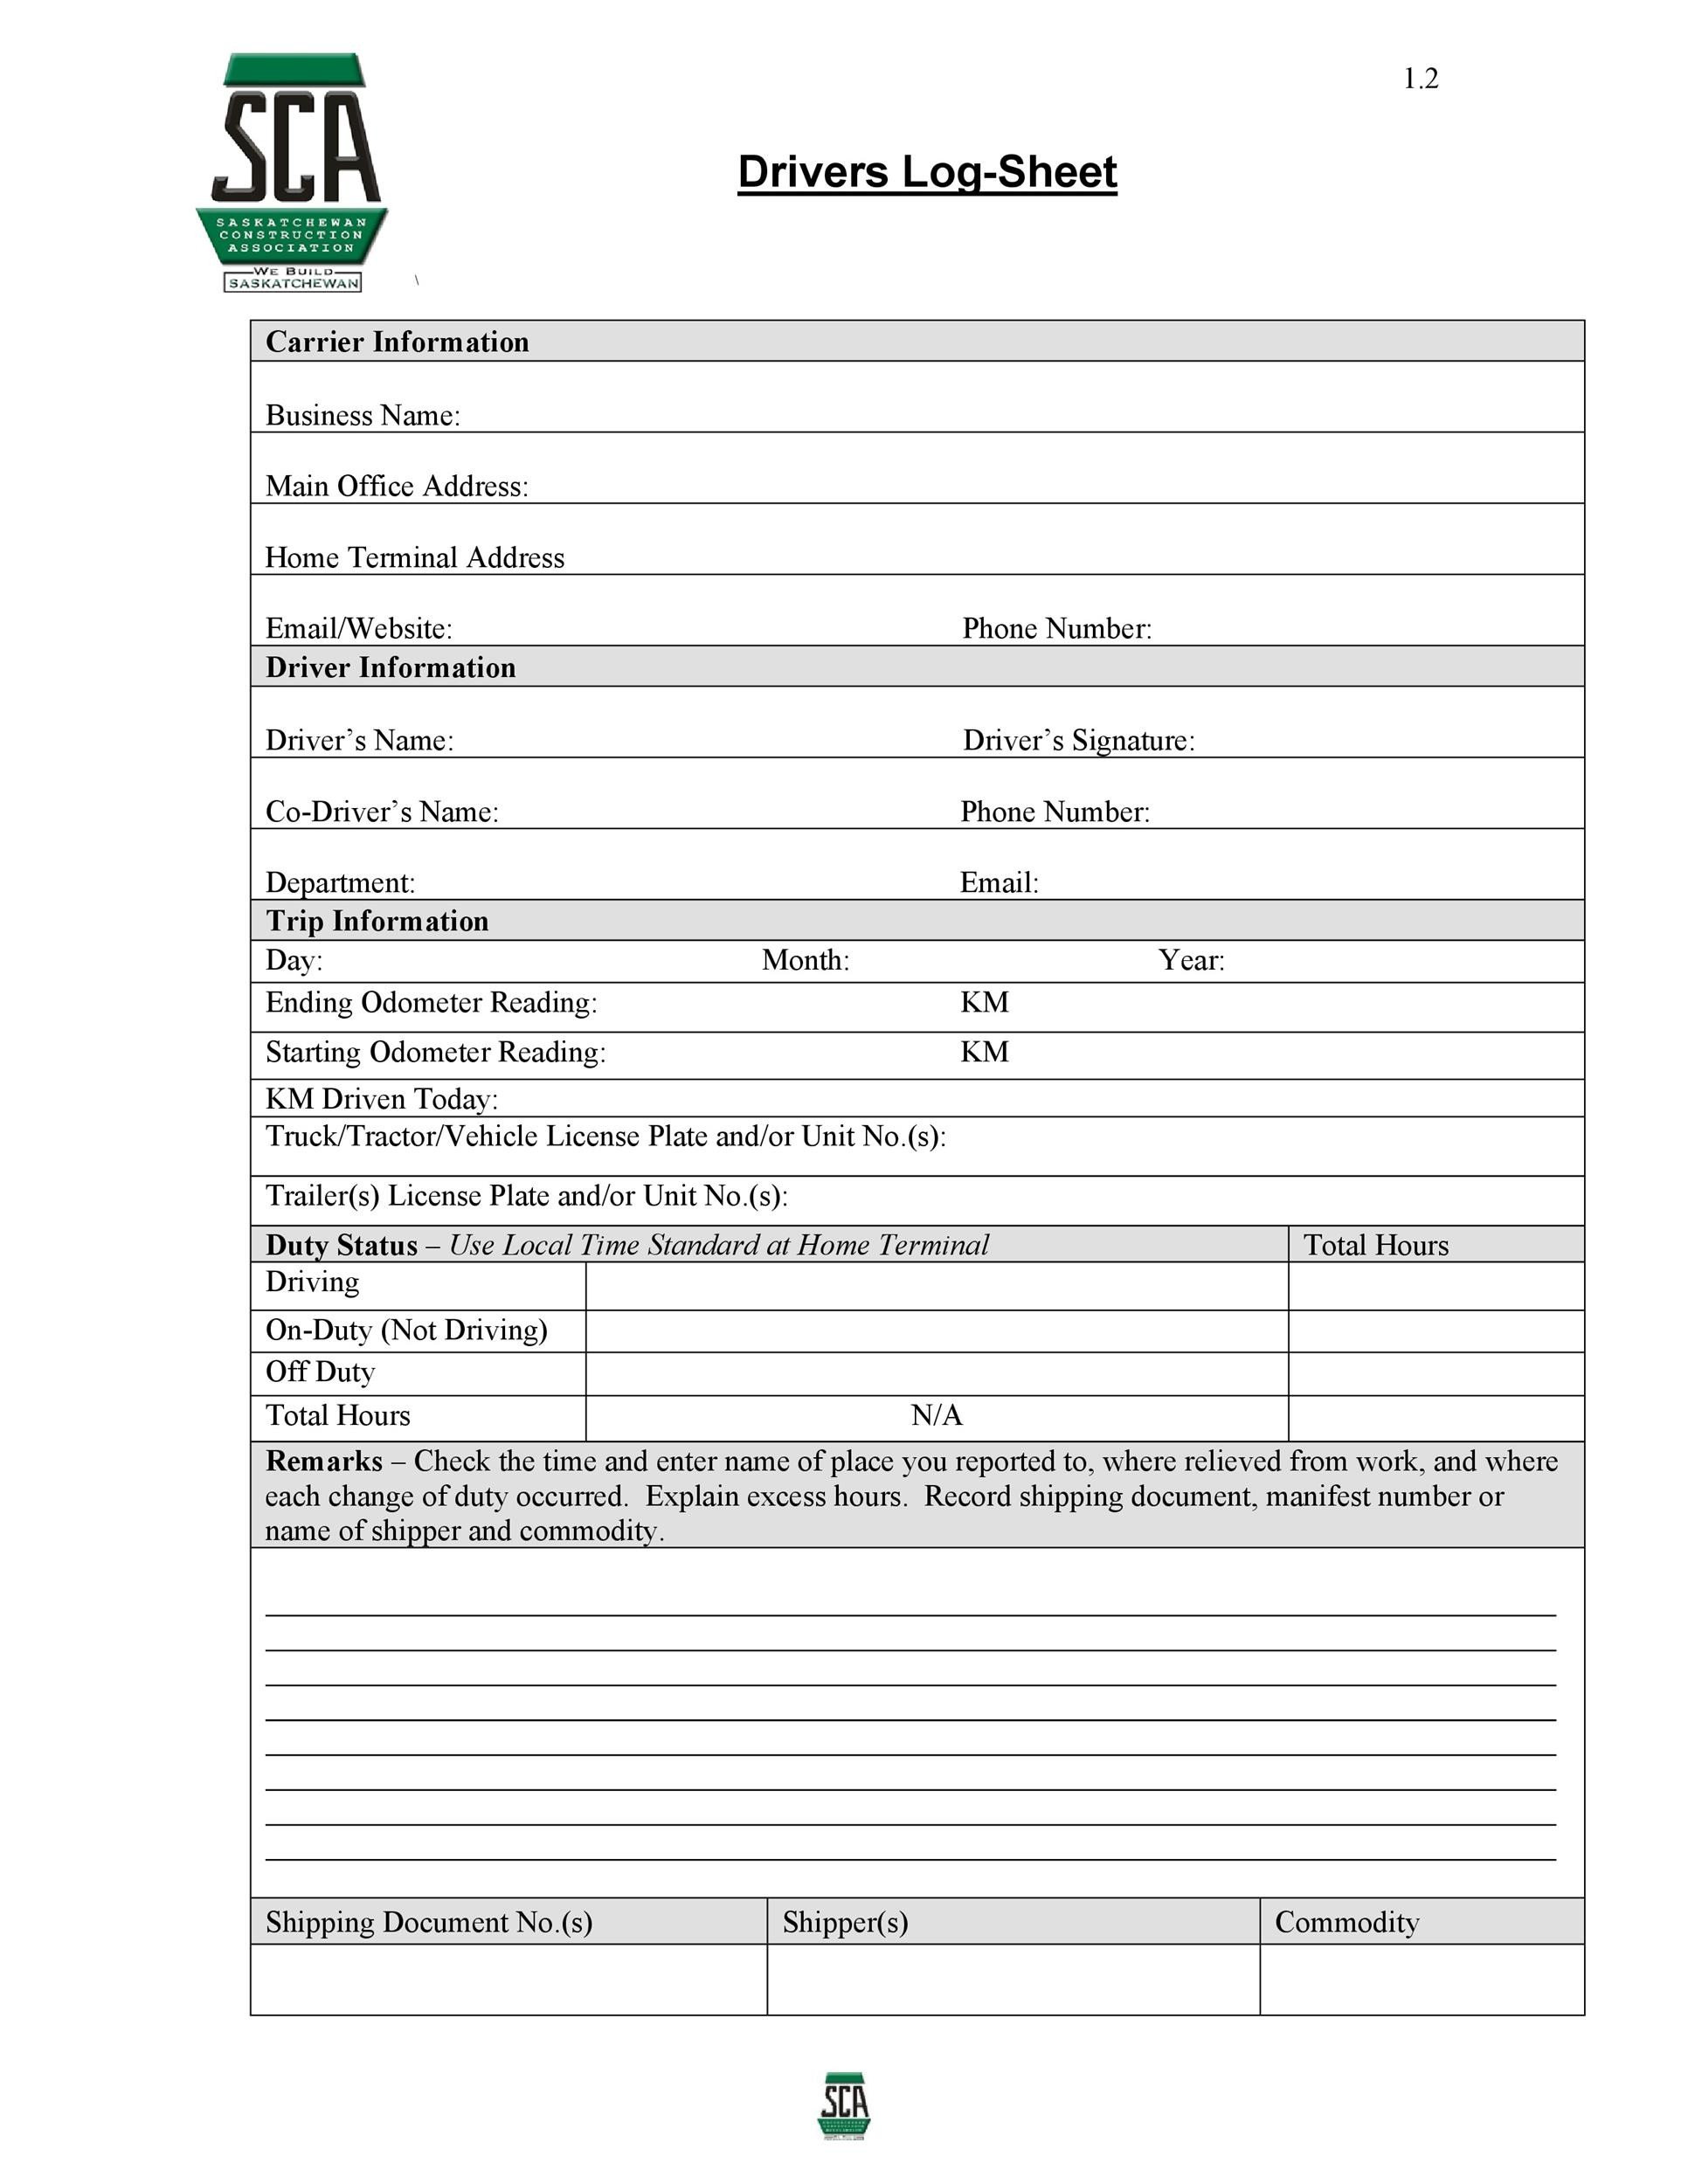 50 Printable Log Sheet Templates Direct Download Template Lab